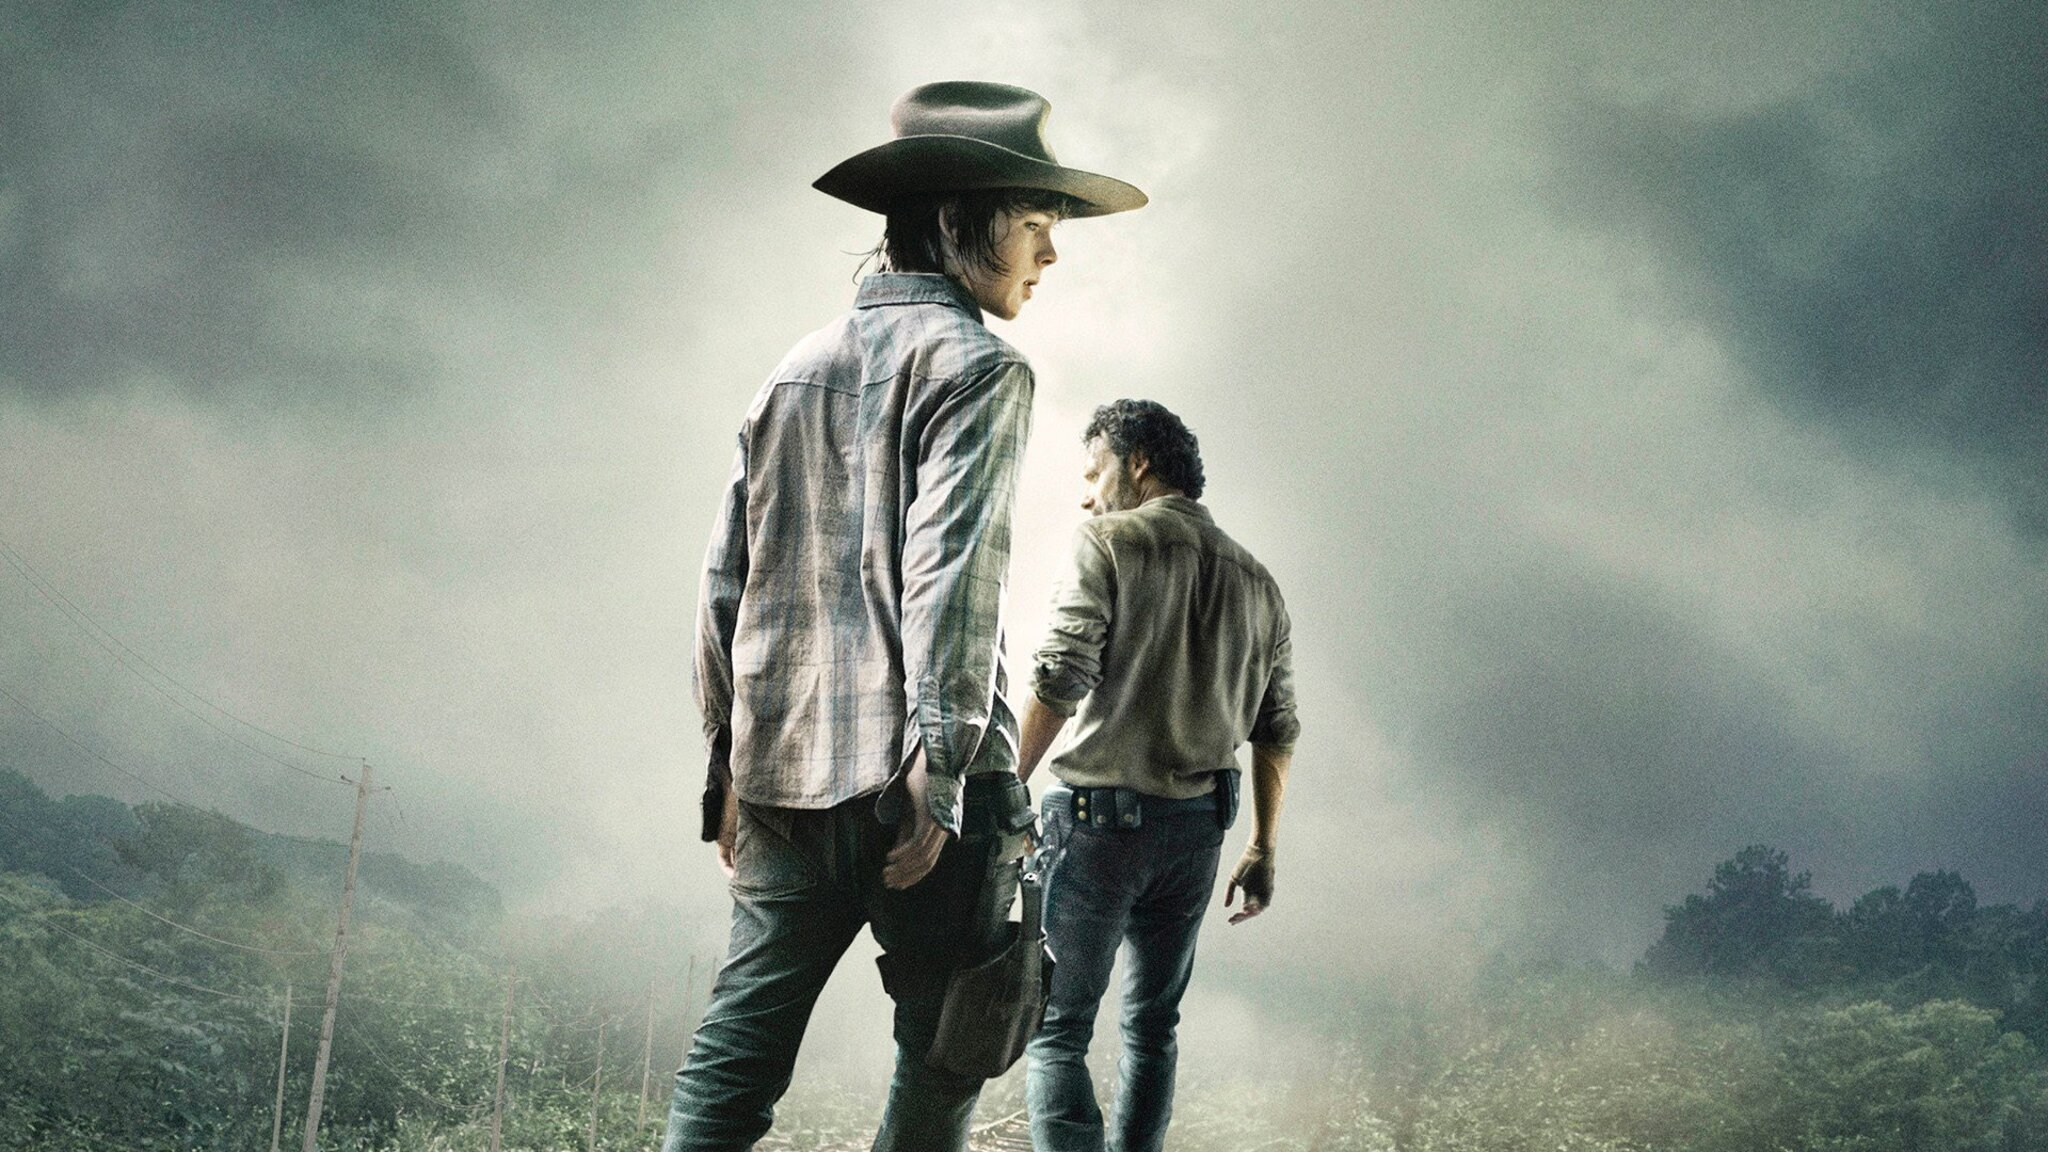 Walking Dead Wallpaper For Android: 2048x1152 The Walking Dead Tv 2048x1152 Resolution HD 4k